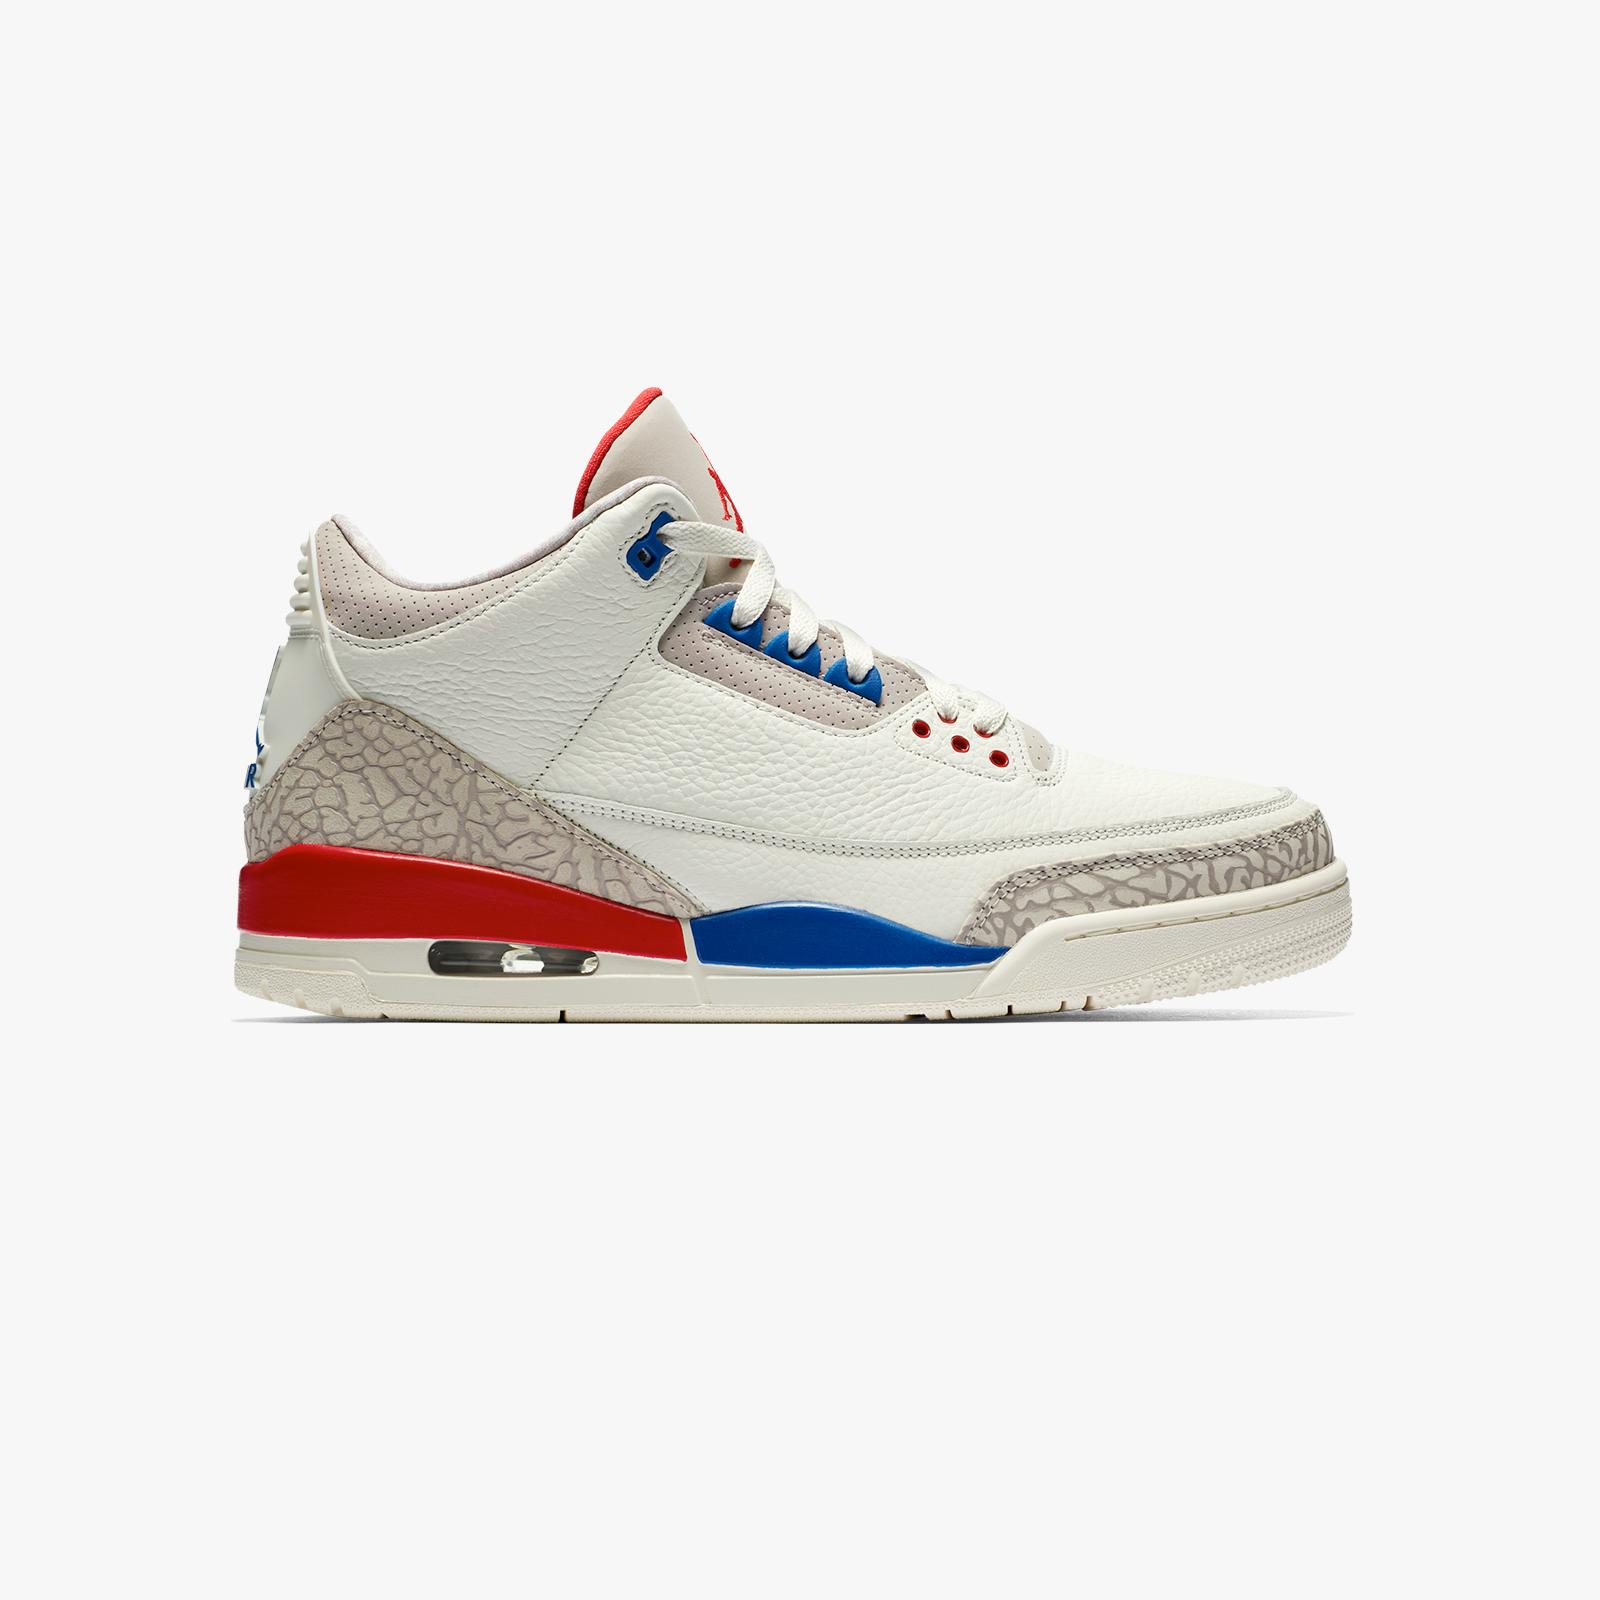 0f90882d398ca2 Jordan Brand Air Jordan 3 Retro - 136064-140 - Sneakersnstuff ...